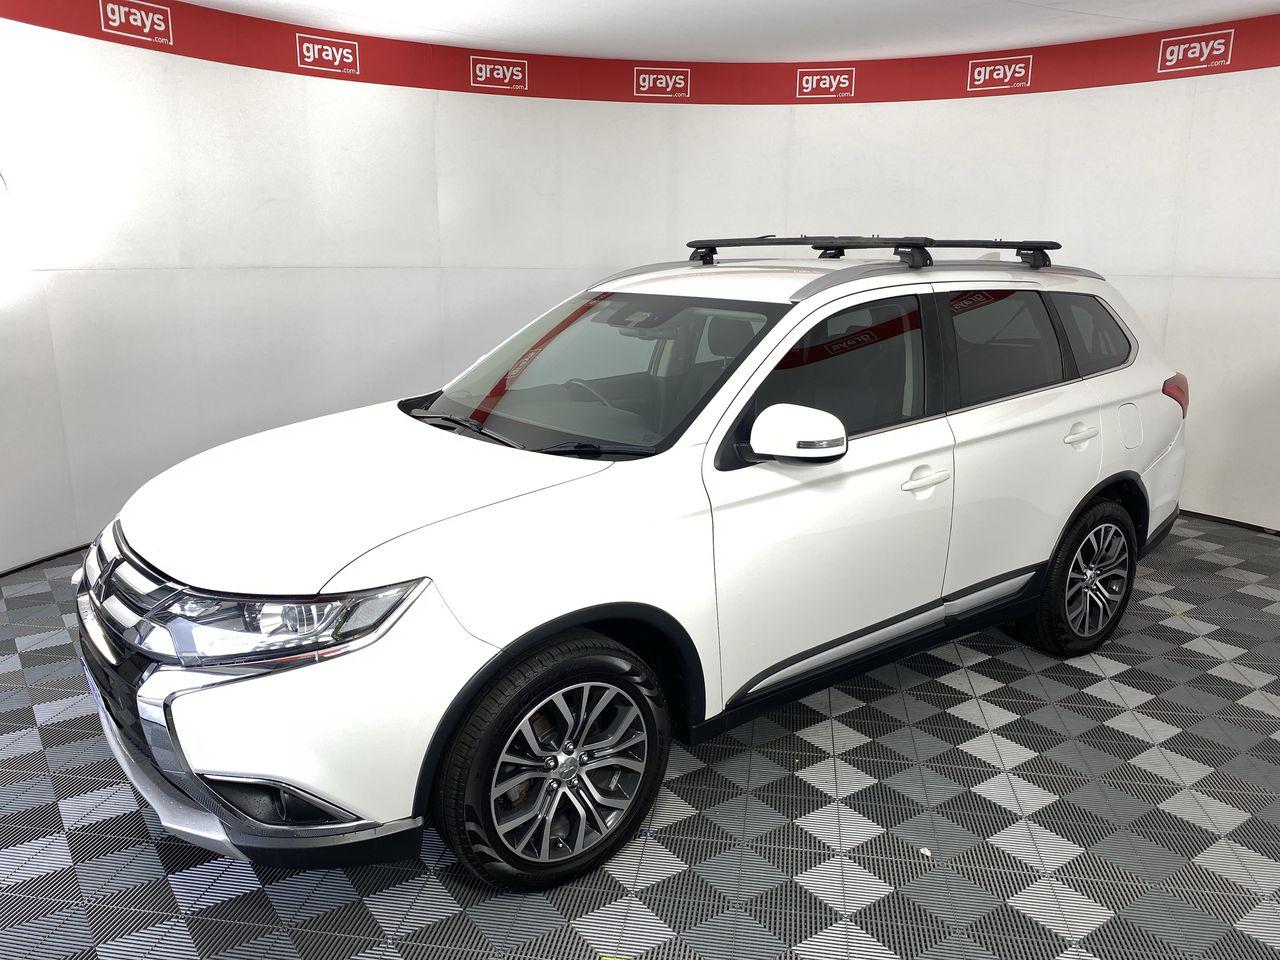 2016 Mitsubishi Outlander LS AWD SAFETY PACK ZK T/Dsl Auto 7 Seats Wagon